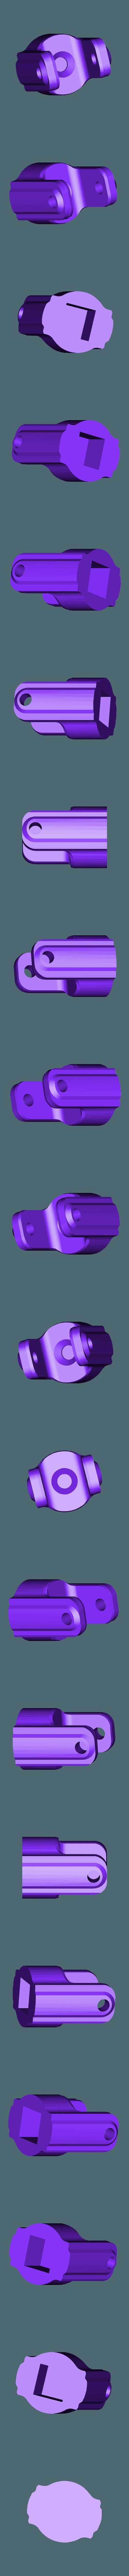 TruckV3_Axle_front_U-joint3.STL Download STL file 3D Printed RC Truck V3 • 3D print model, MrCrankyface